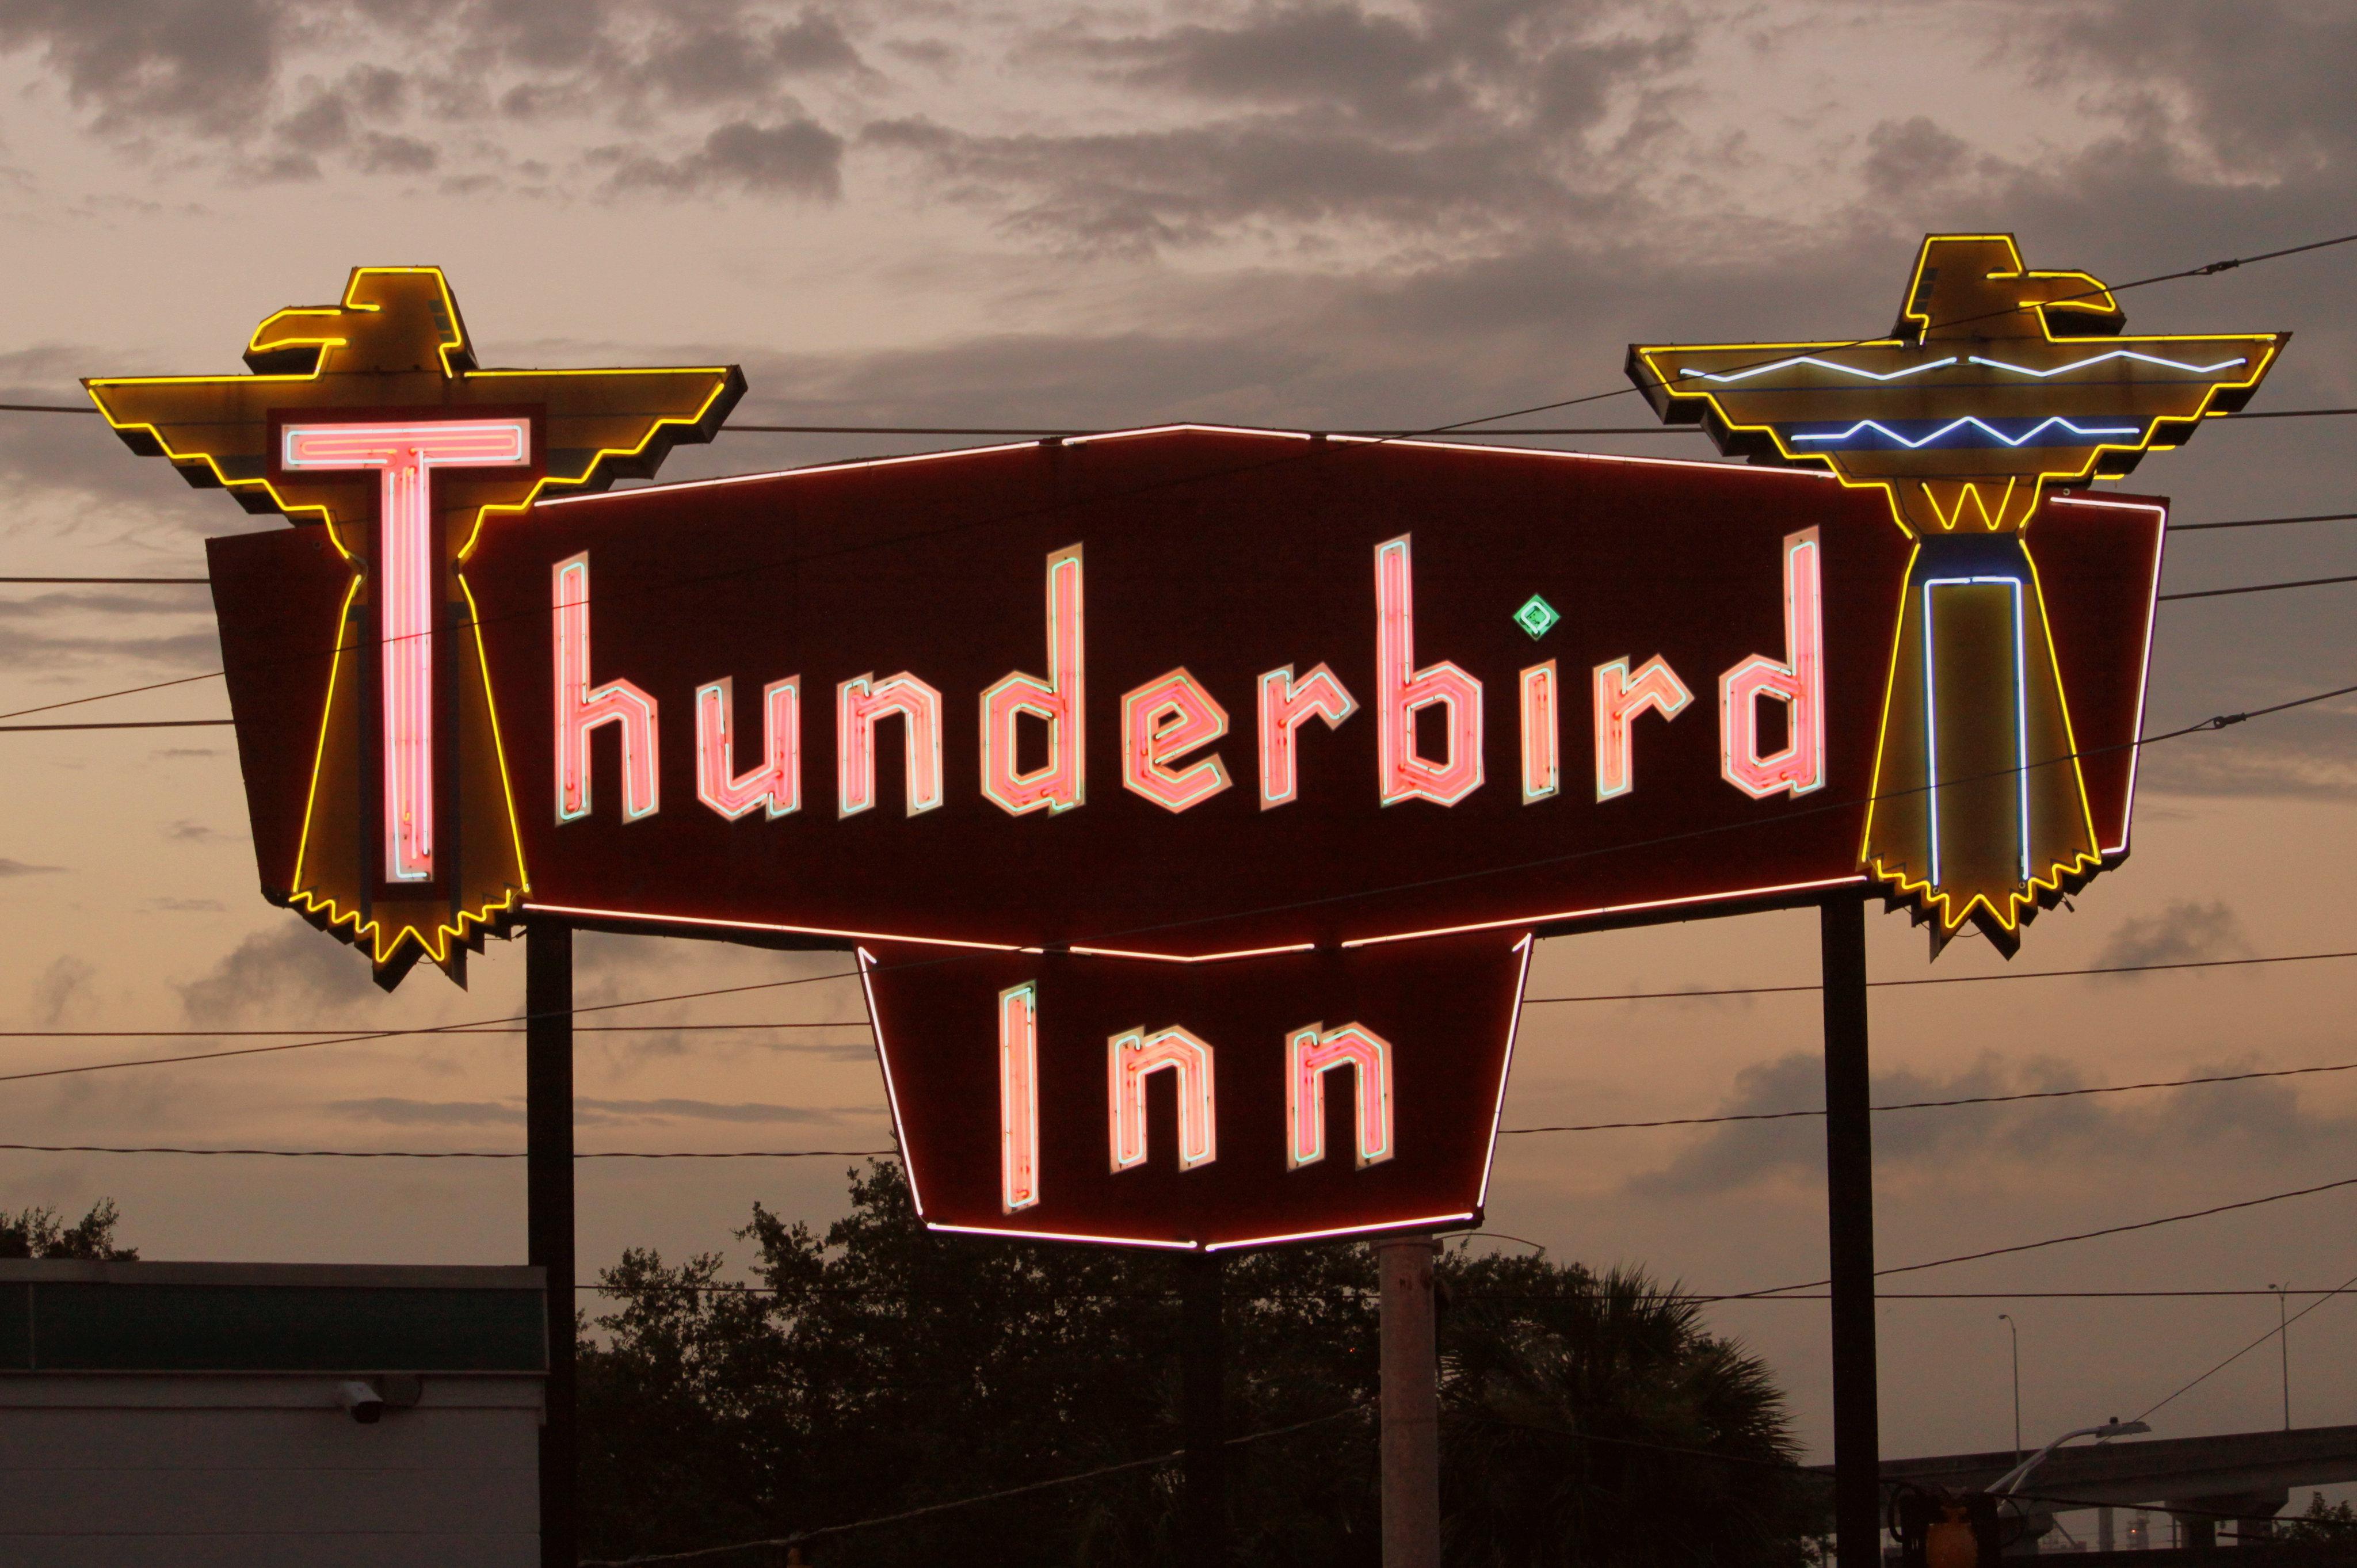 Thunderbird Inn – 611 West Oglethorpe Avenue, Savannah, Georgia U.S.A. - June 10, 2020